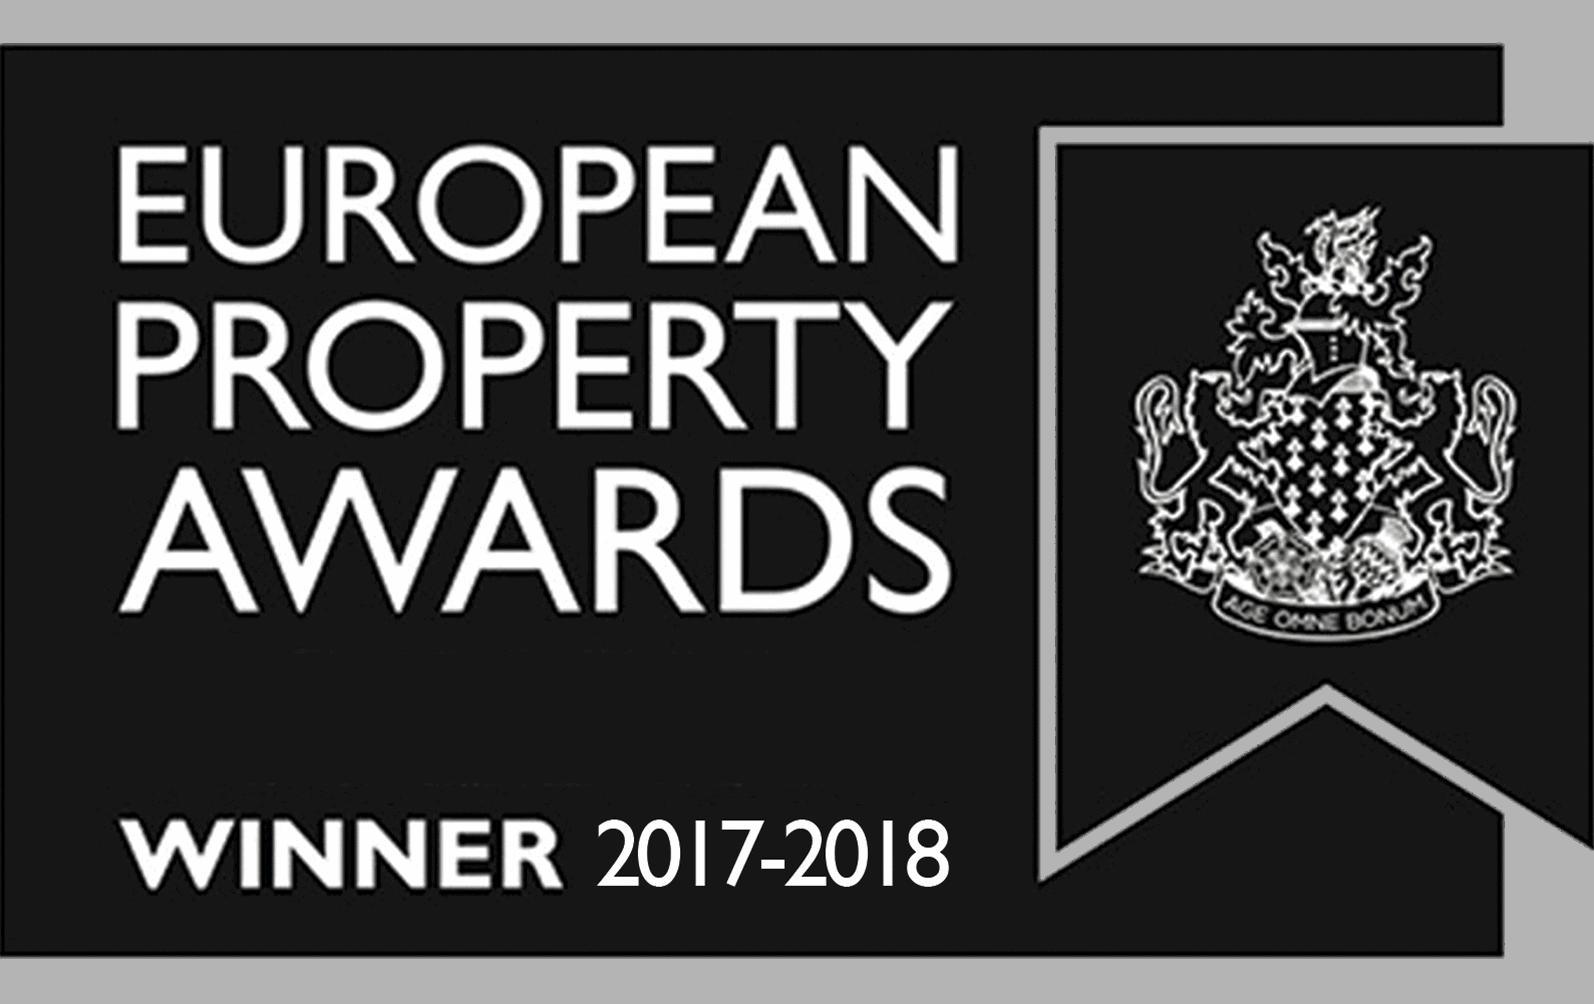 European Property Awards 2017-2018